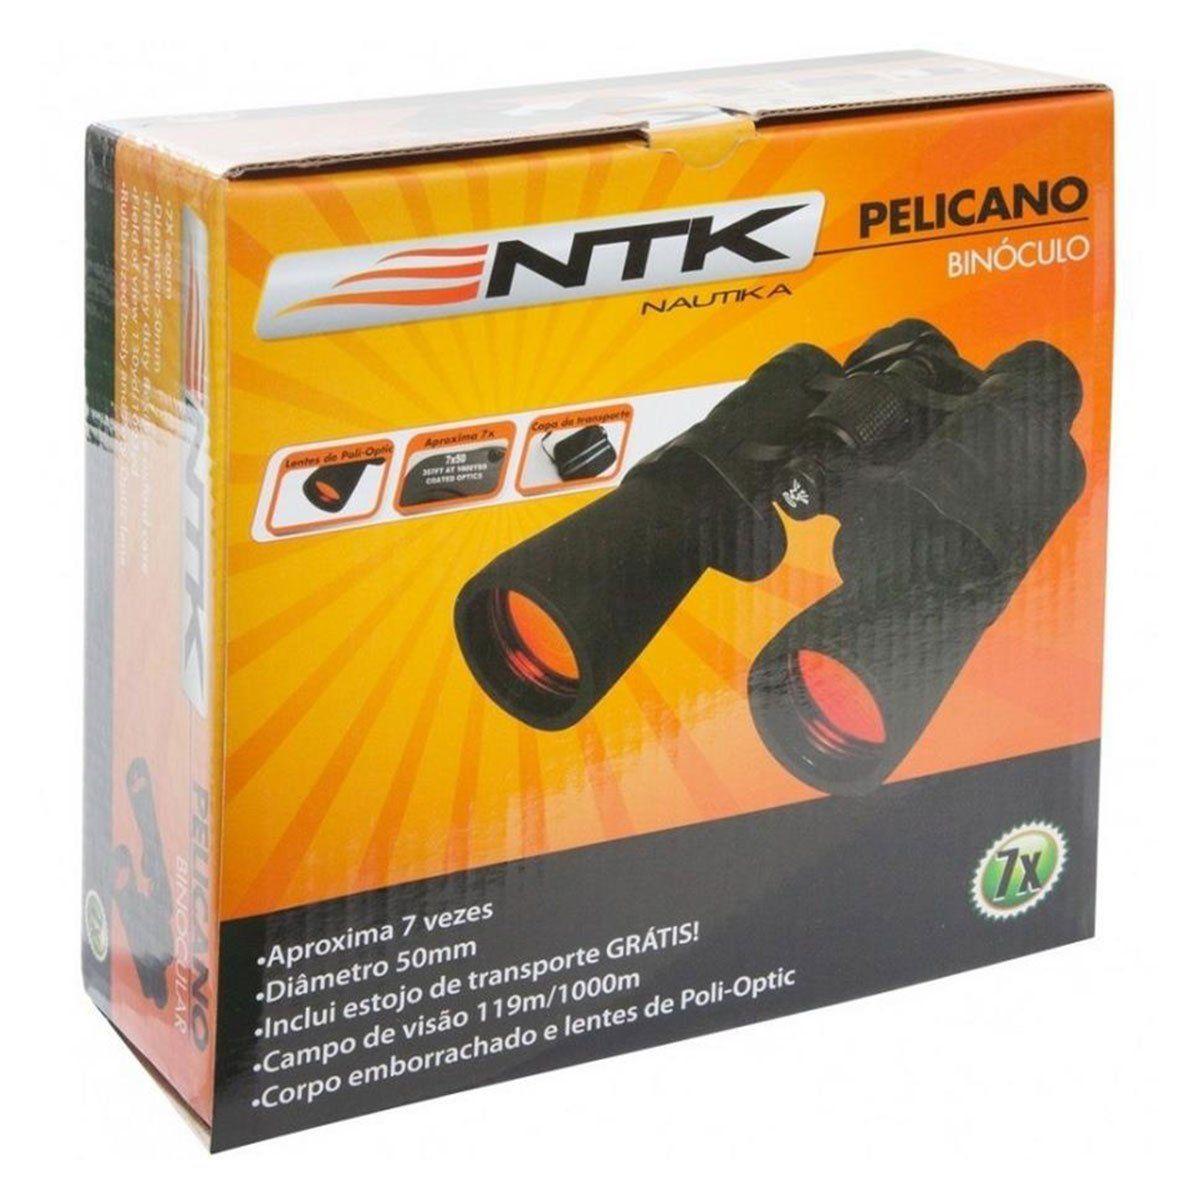 Binóculo Nautika Pelicano 7x50mm